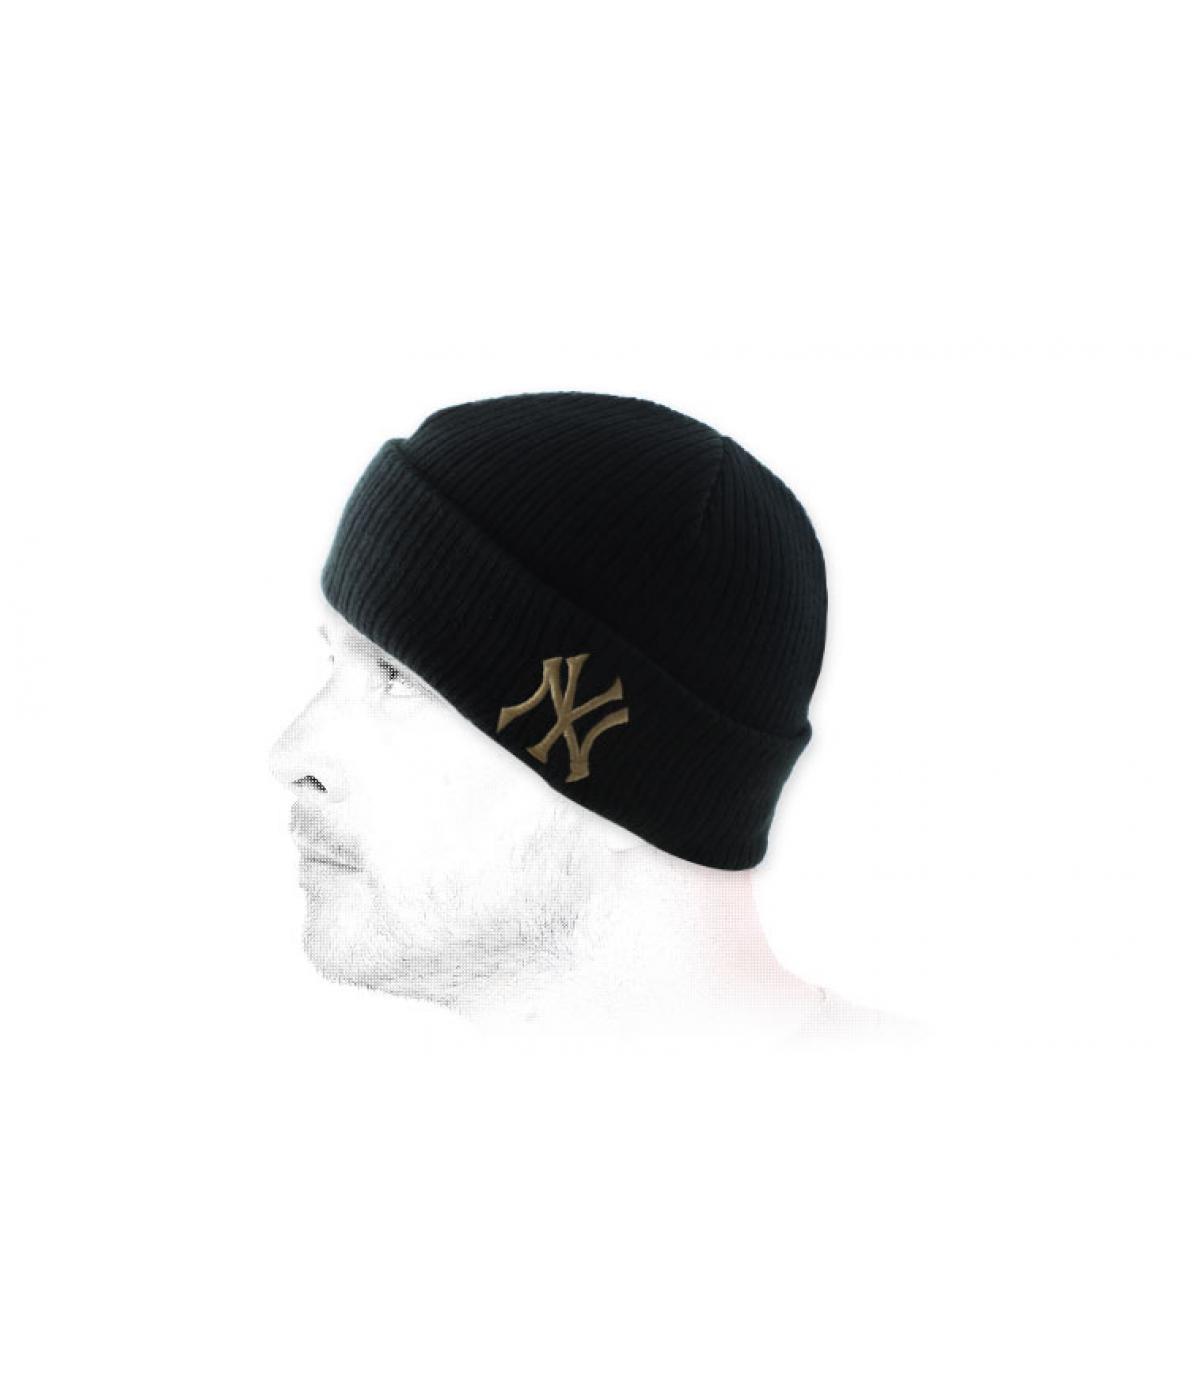 Bonnet NY zwarte omkering